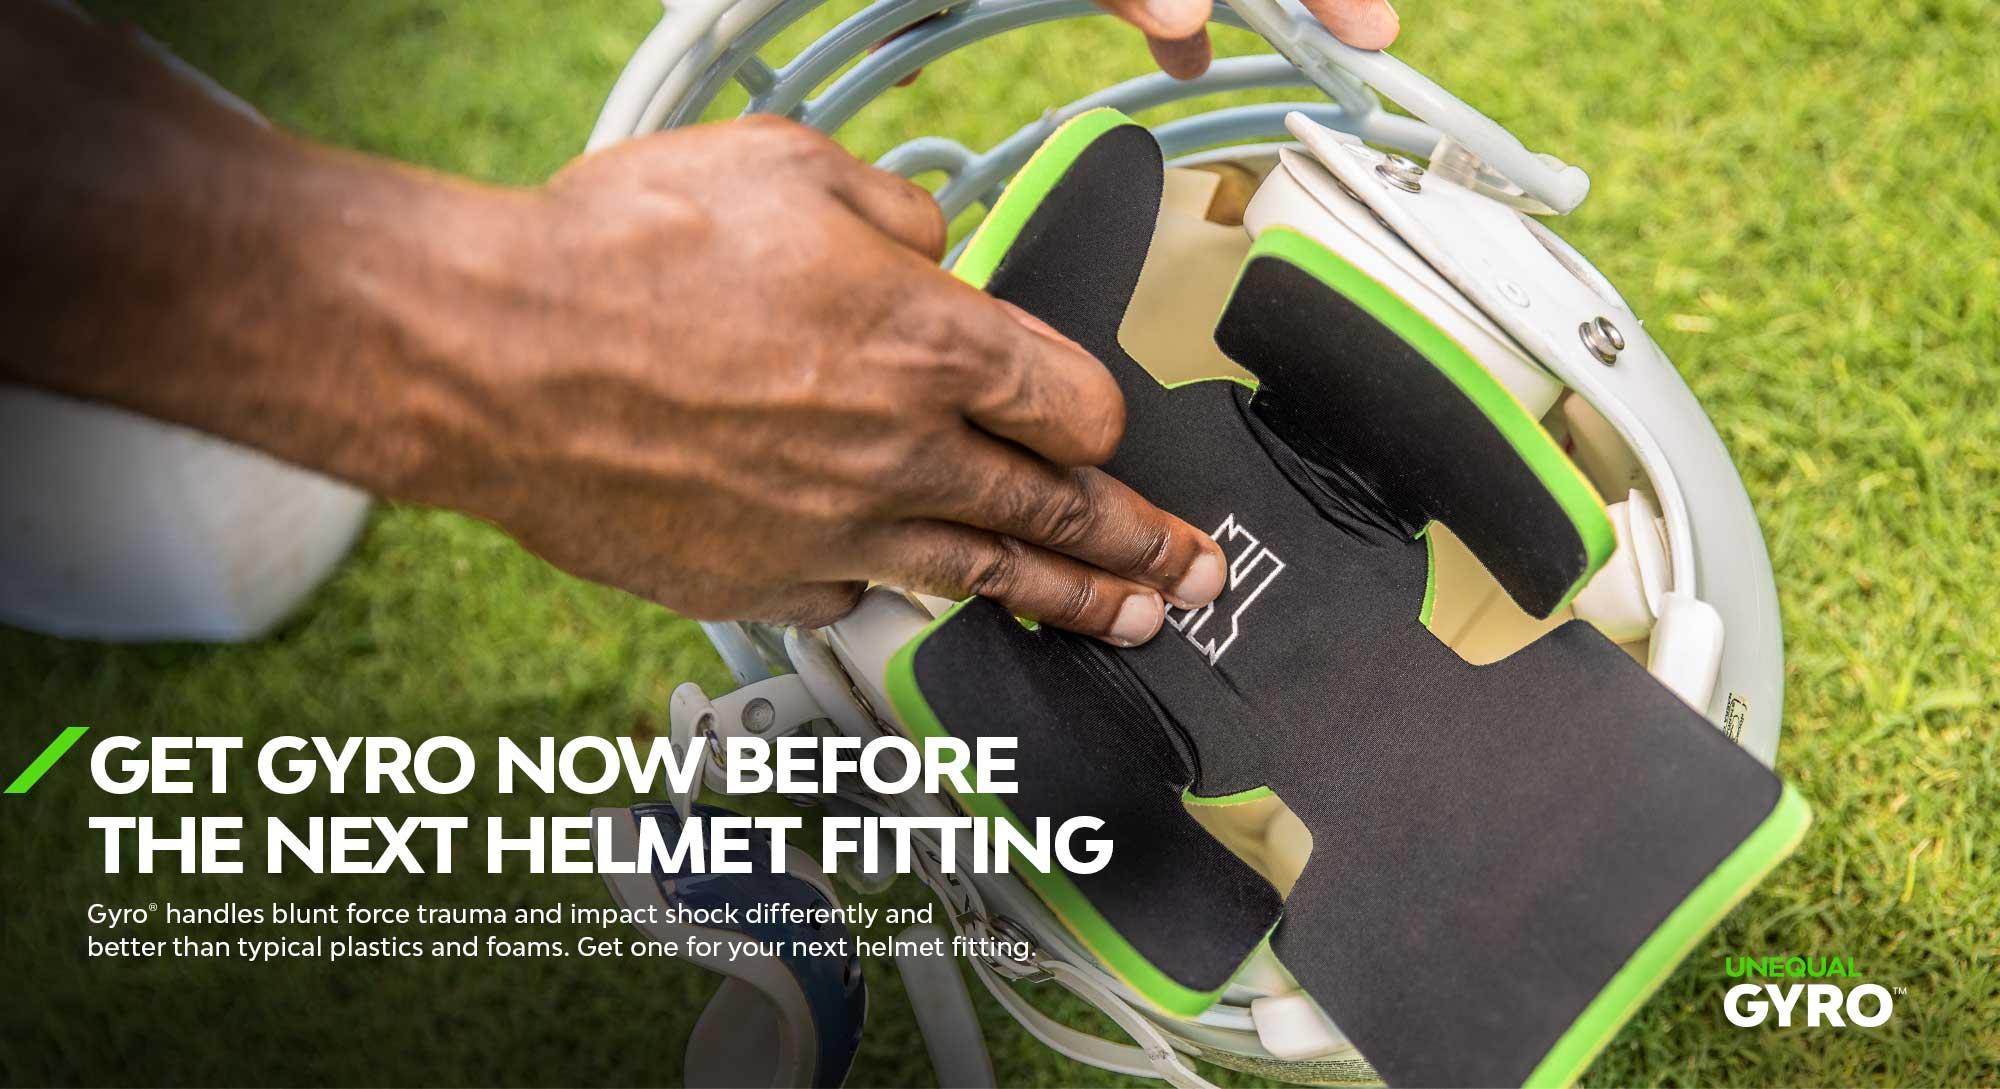 Gyro Helmet Liner